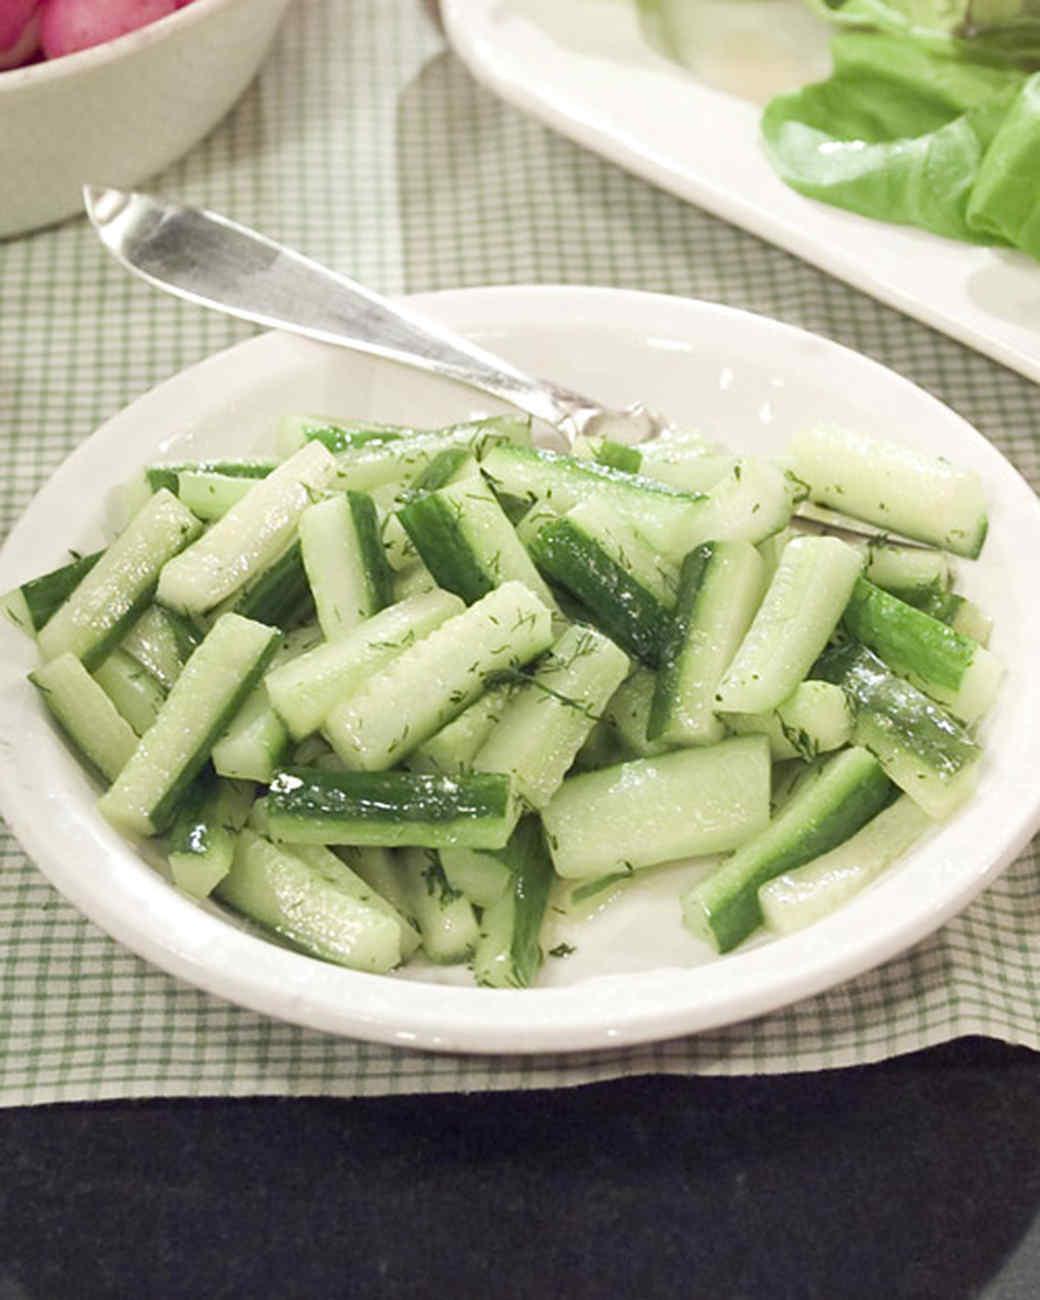 Sauteed Cucumbers with Green Herbs